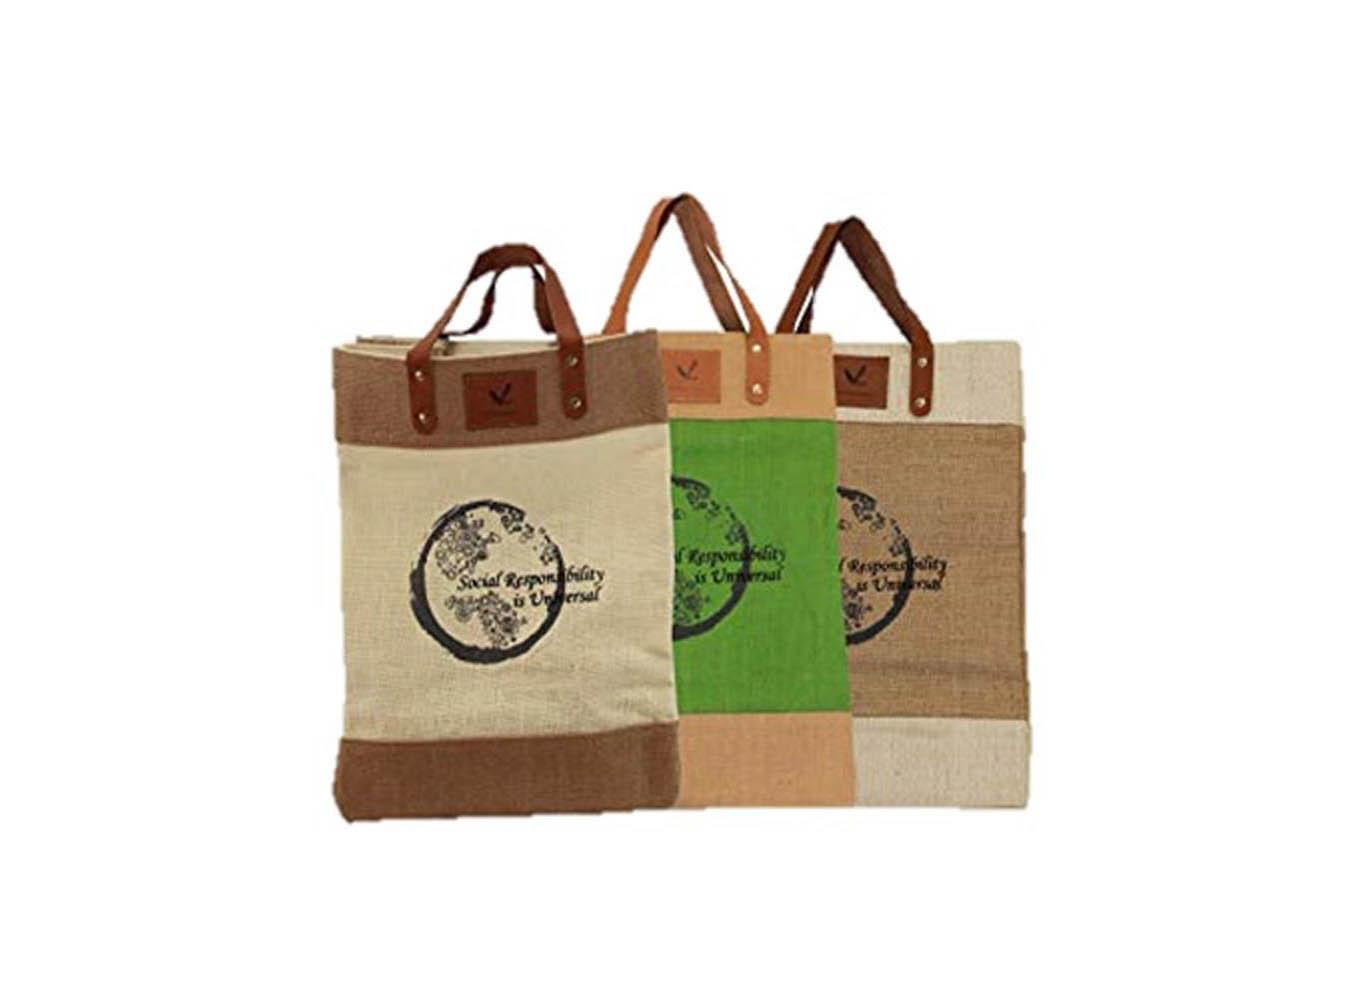 Custom Printed Jute Tote Bag w/ Leather Handle